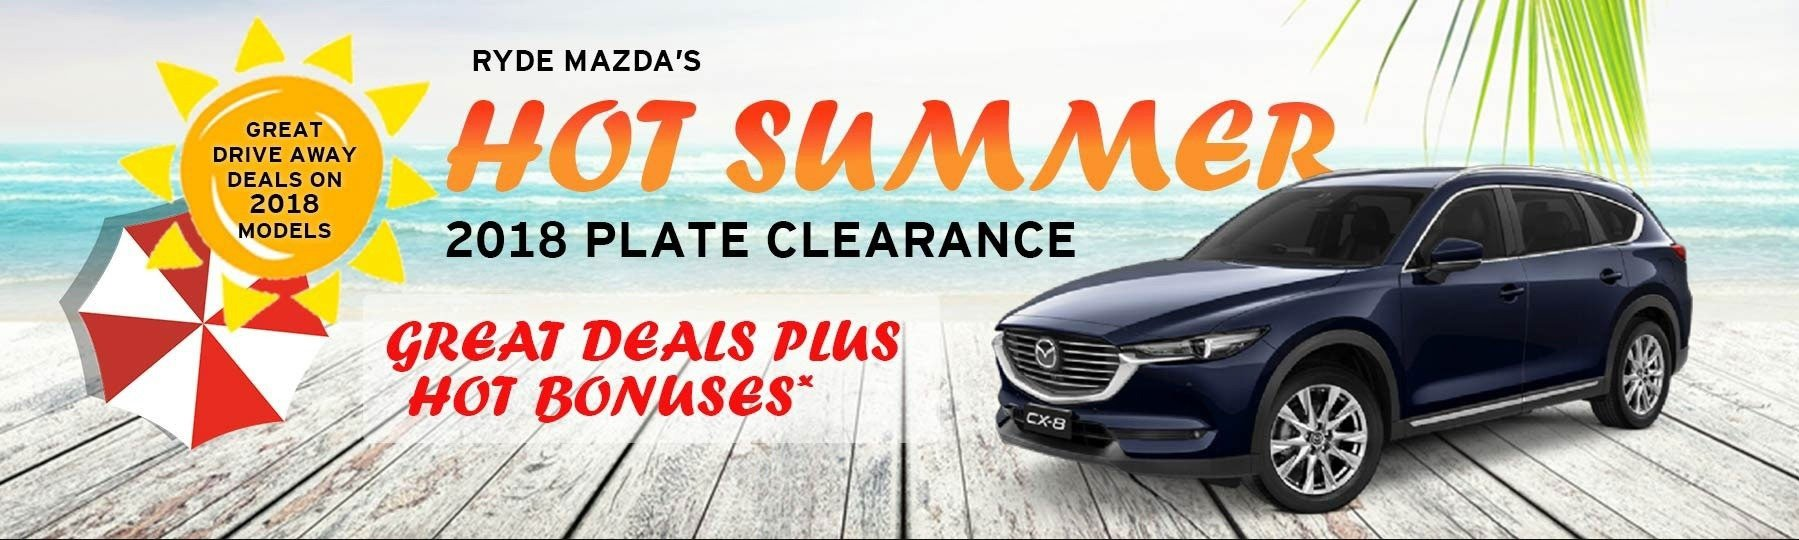 Ryde Mazda Hot Summer 2018 Plate Clearance